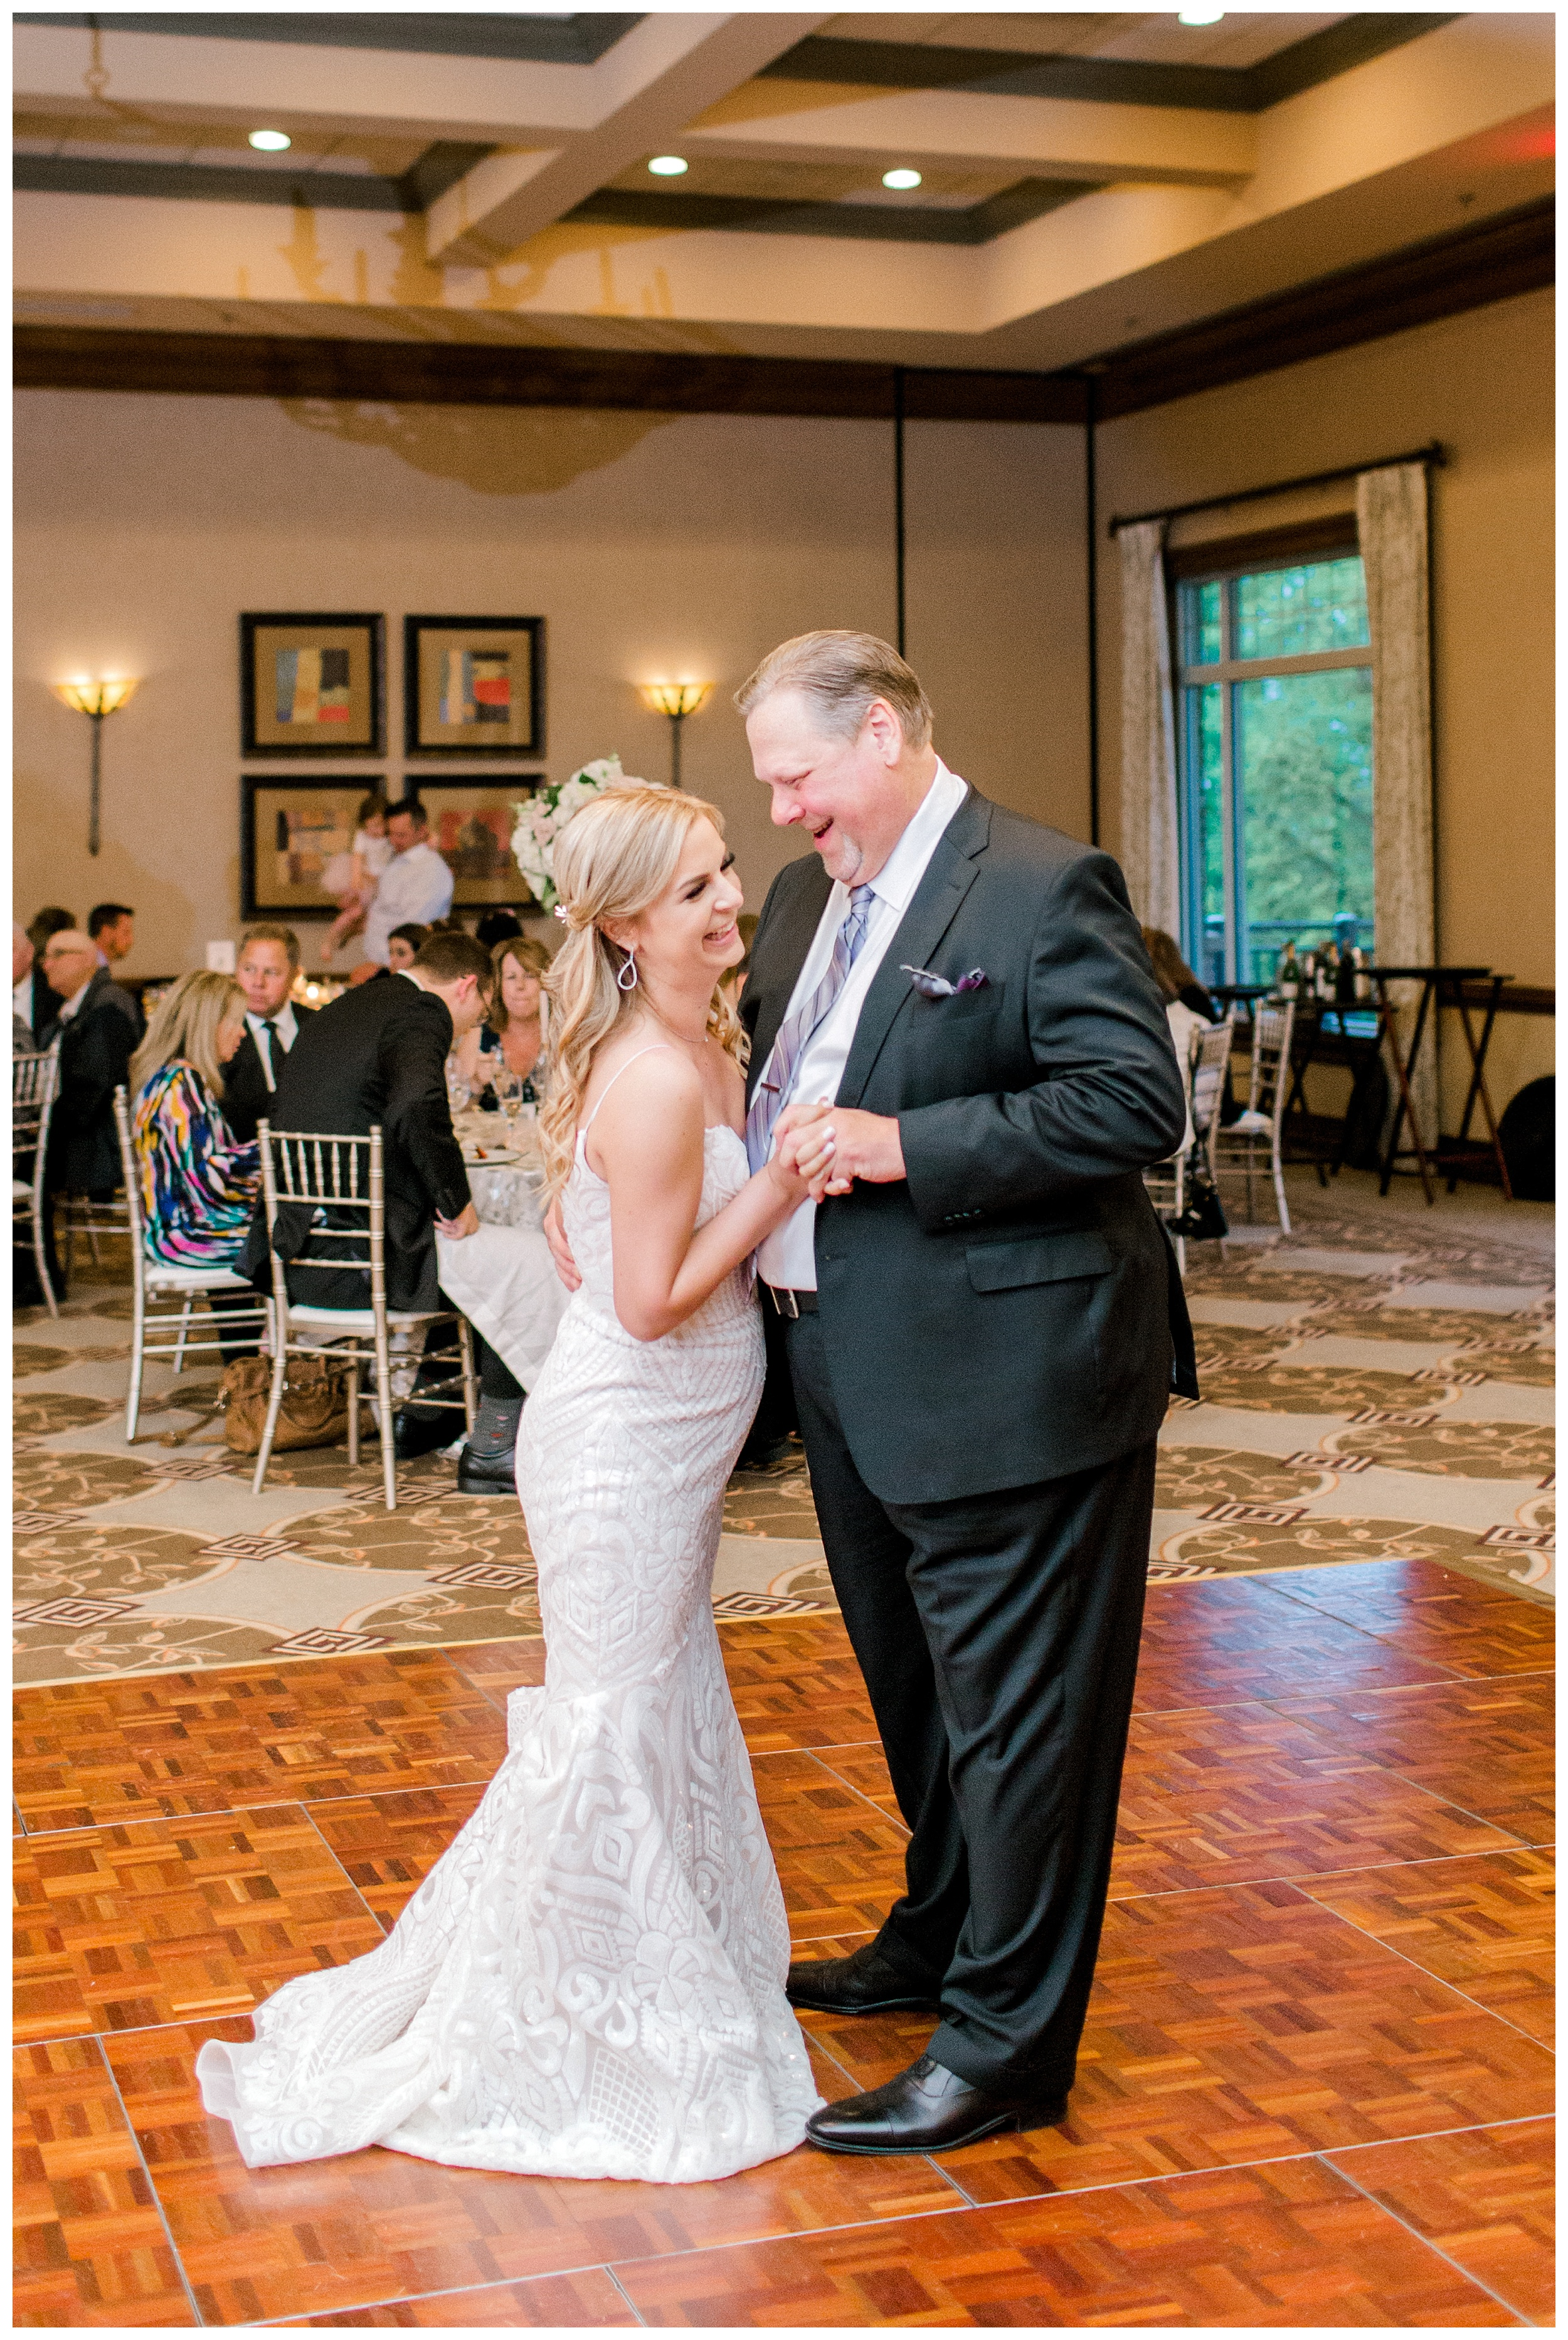 Lansdowne Resort Wedding | Virginia Film Wedding Photographer Kir Tuben_0065.jpg